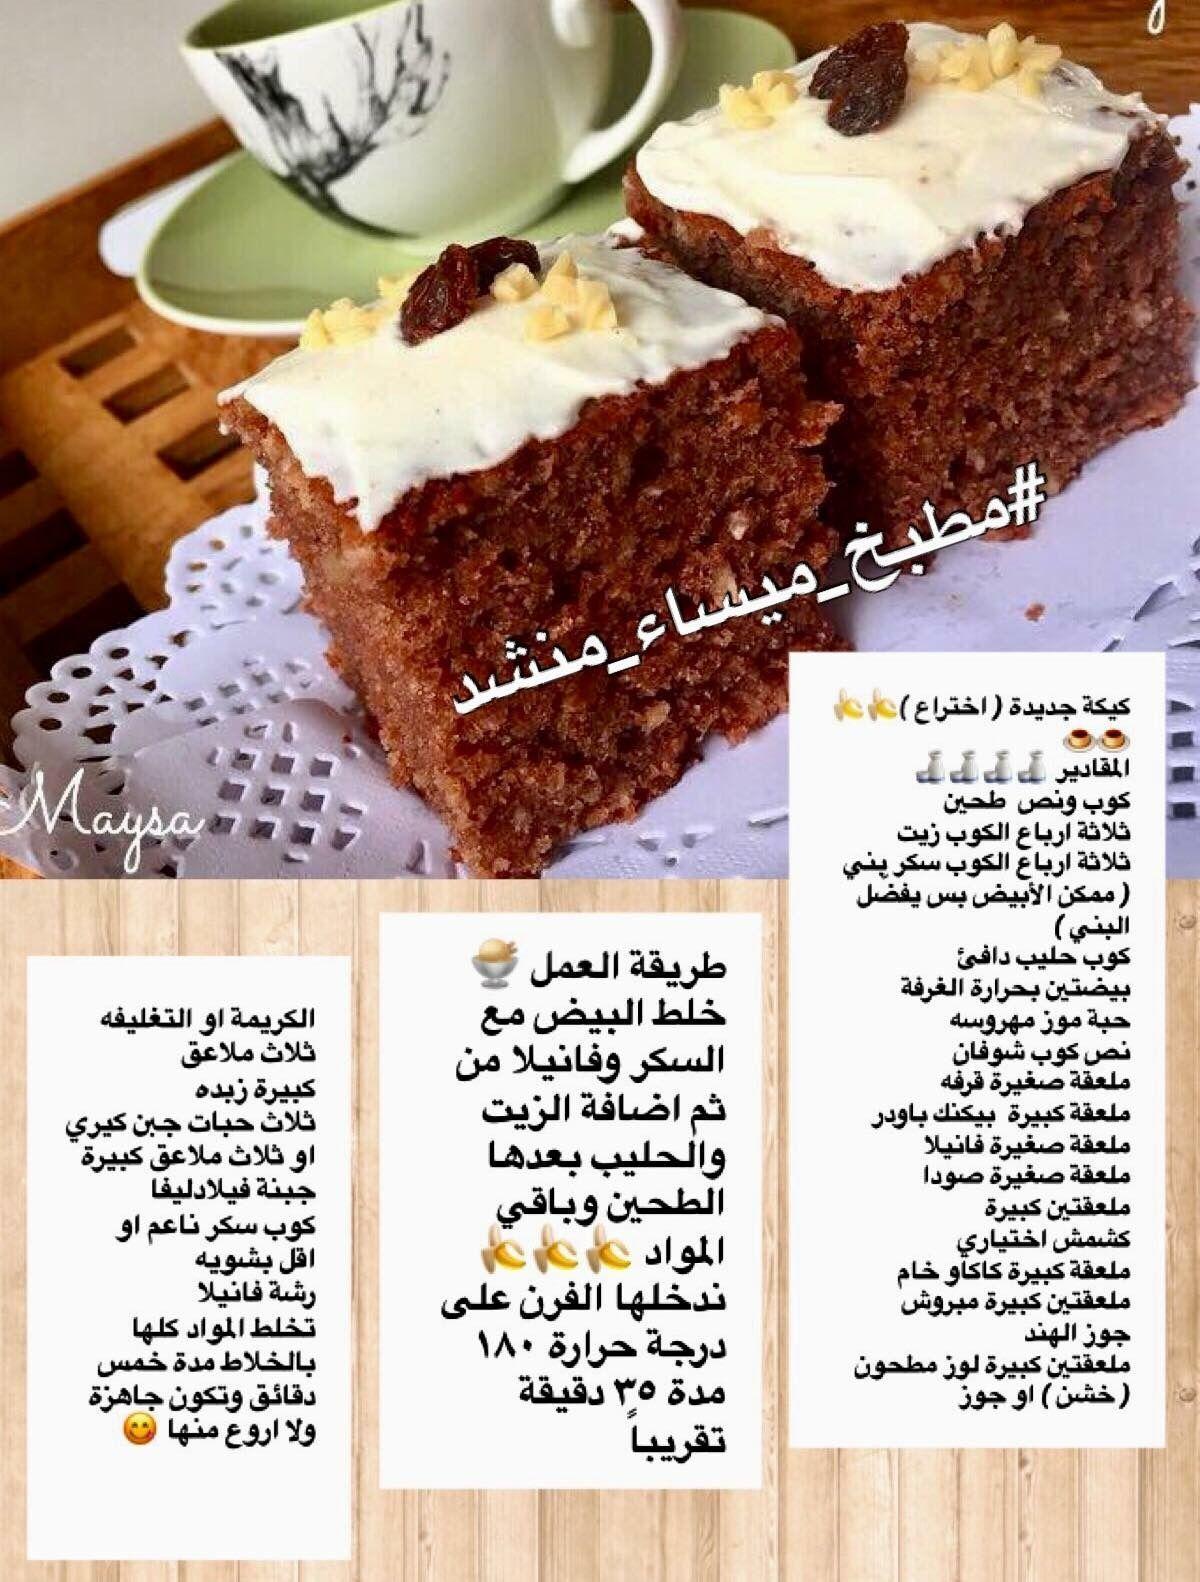 Pin By Wajeeha Alramadan On Arabic Sweets Cooking Cake Brown Butter Chocolate Chip Cookies Arabic Food